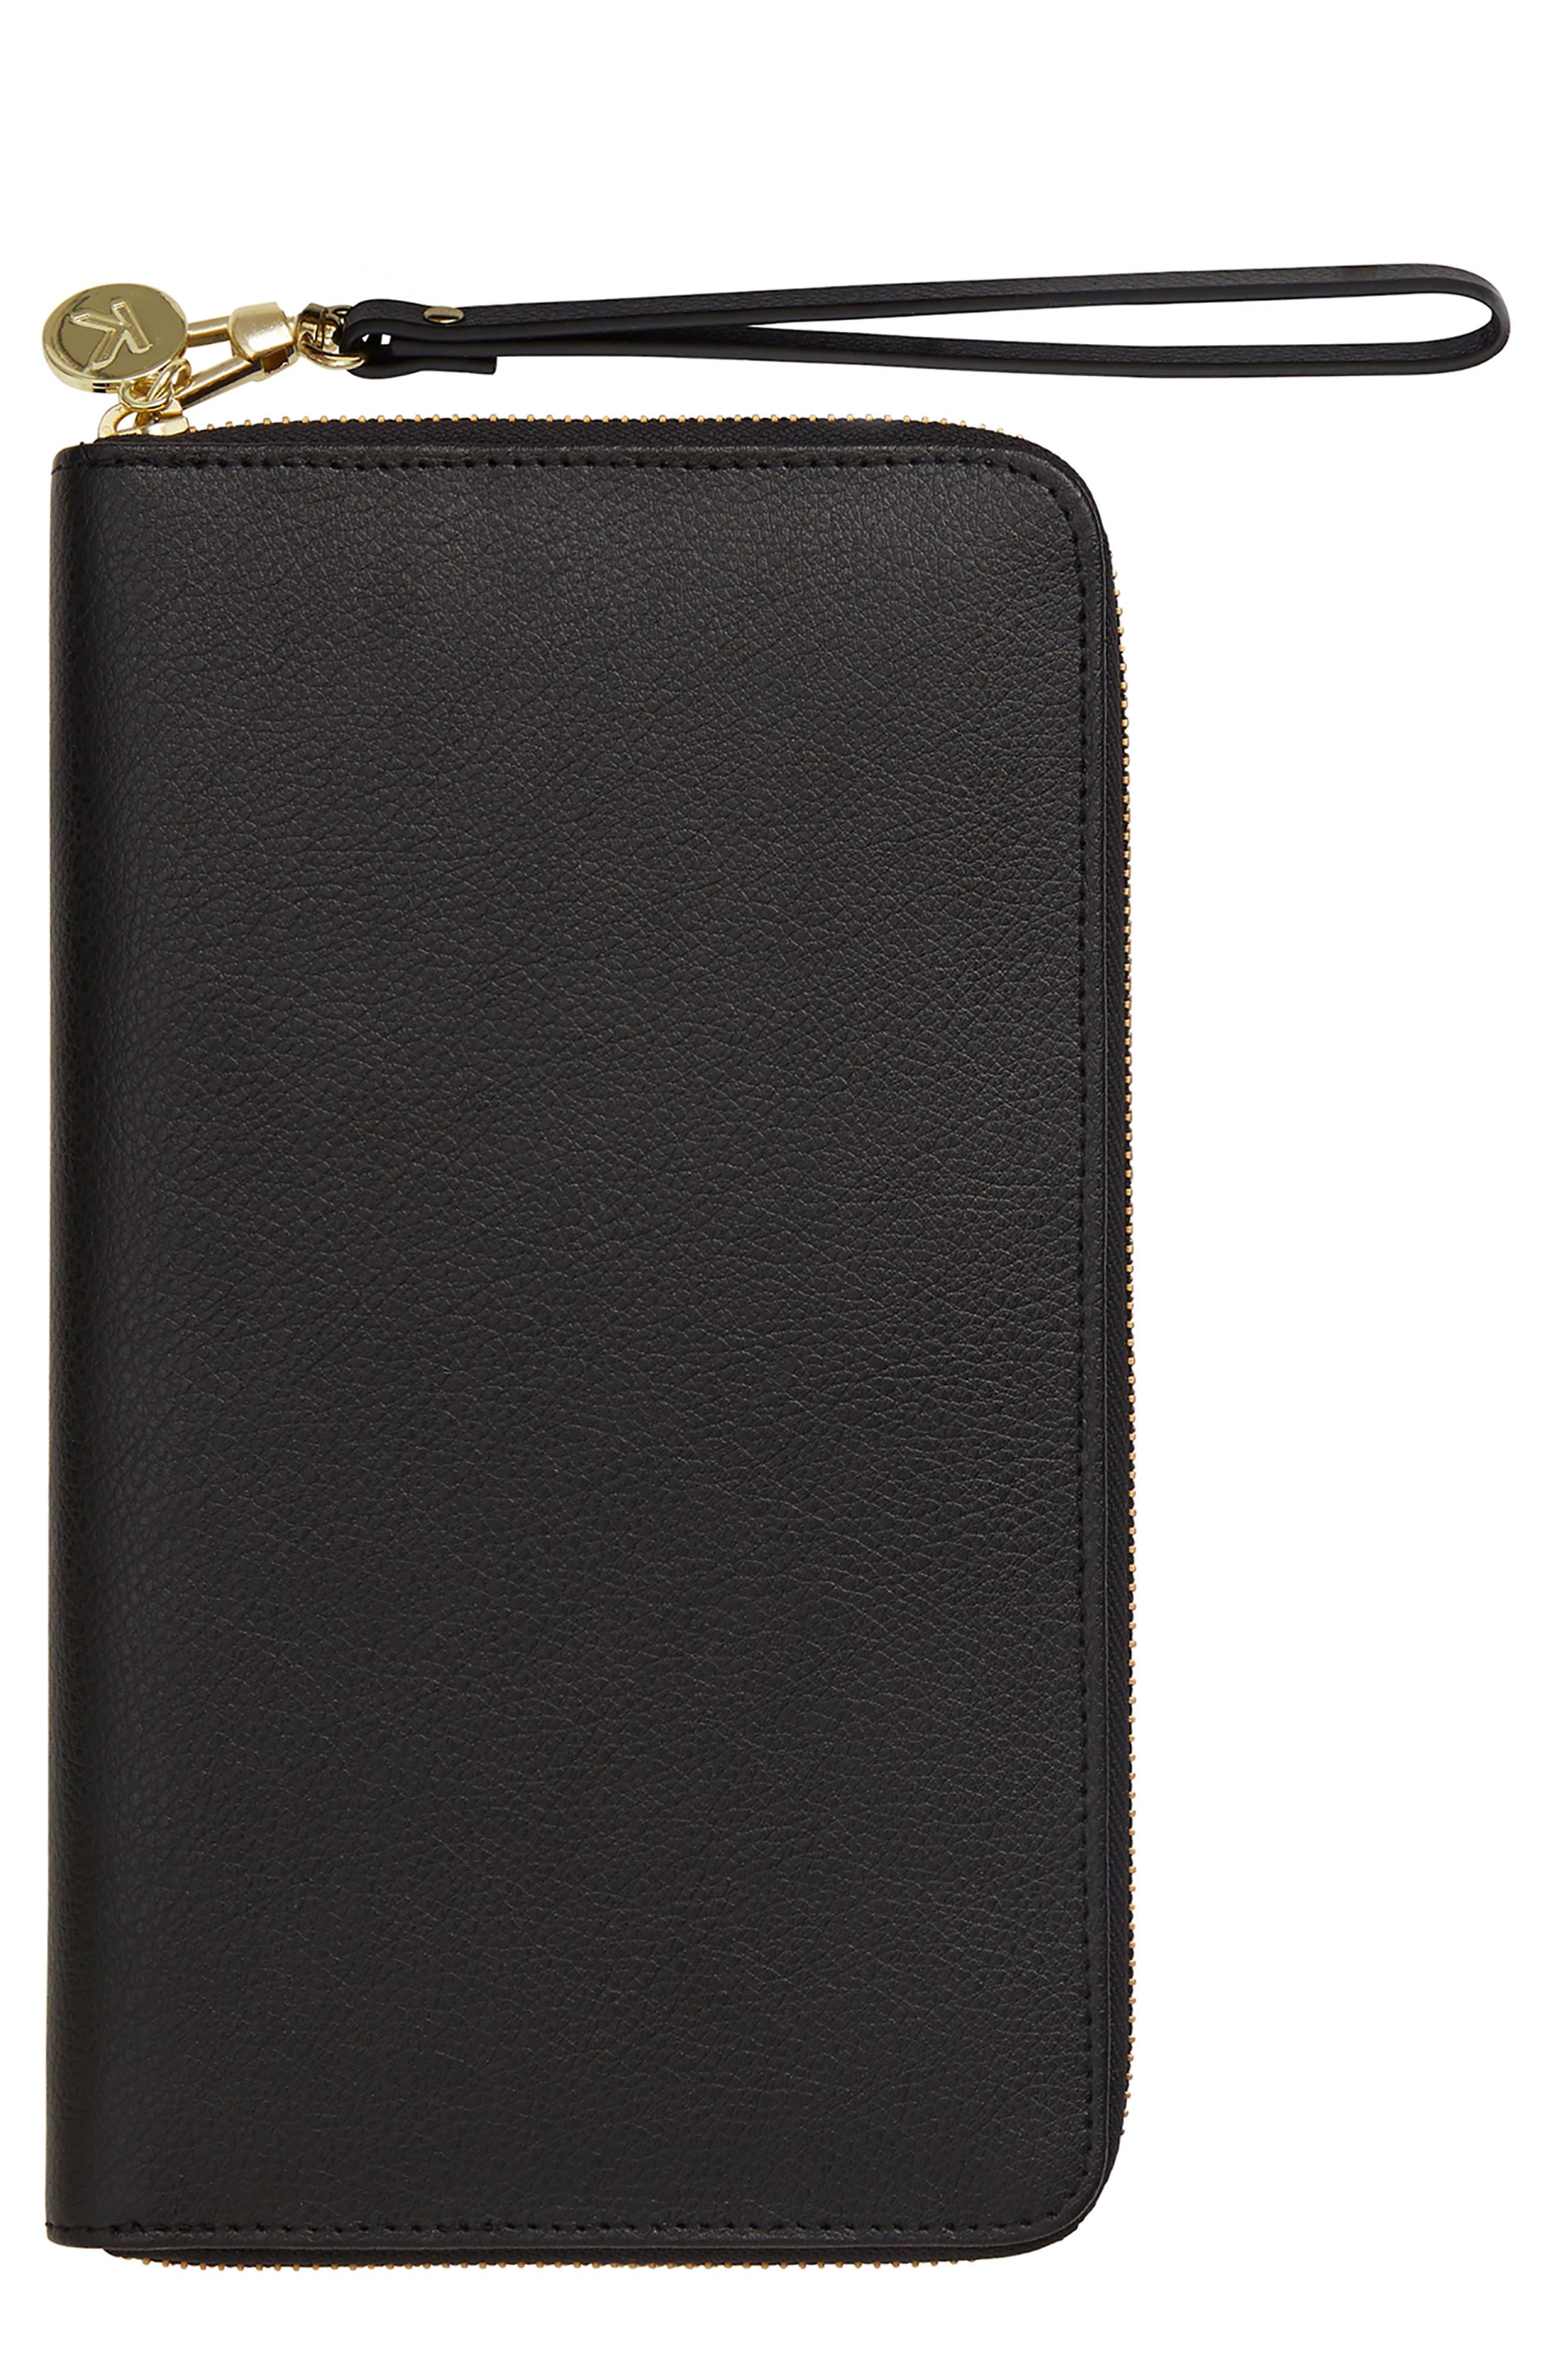 Leather Zip-Around Travel Wallet,                         Main,                         color, JET BLACK